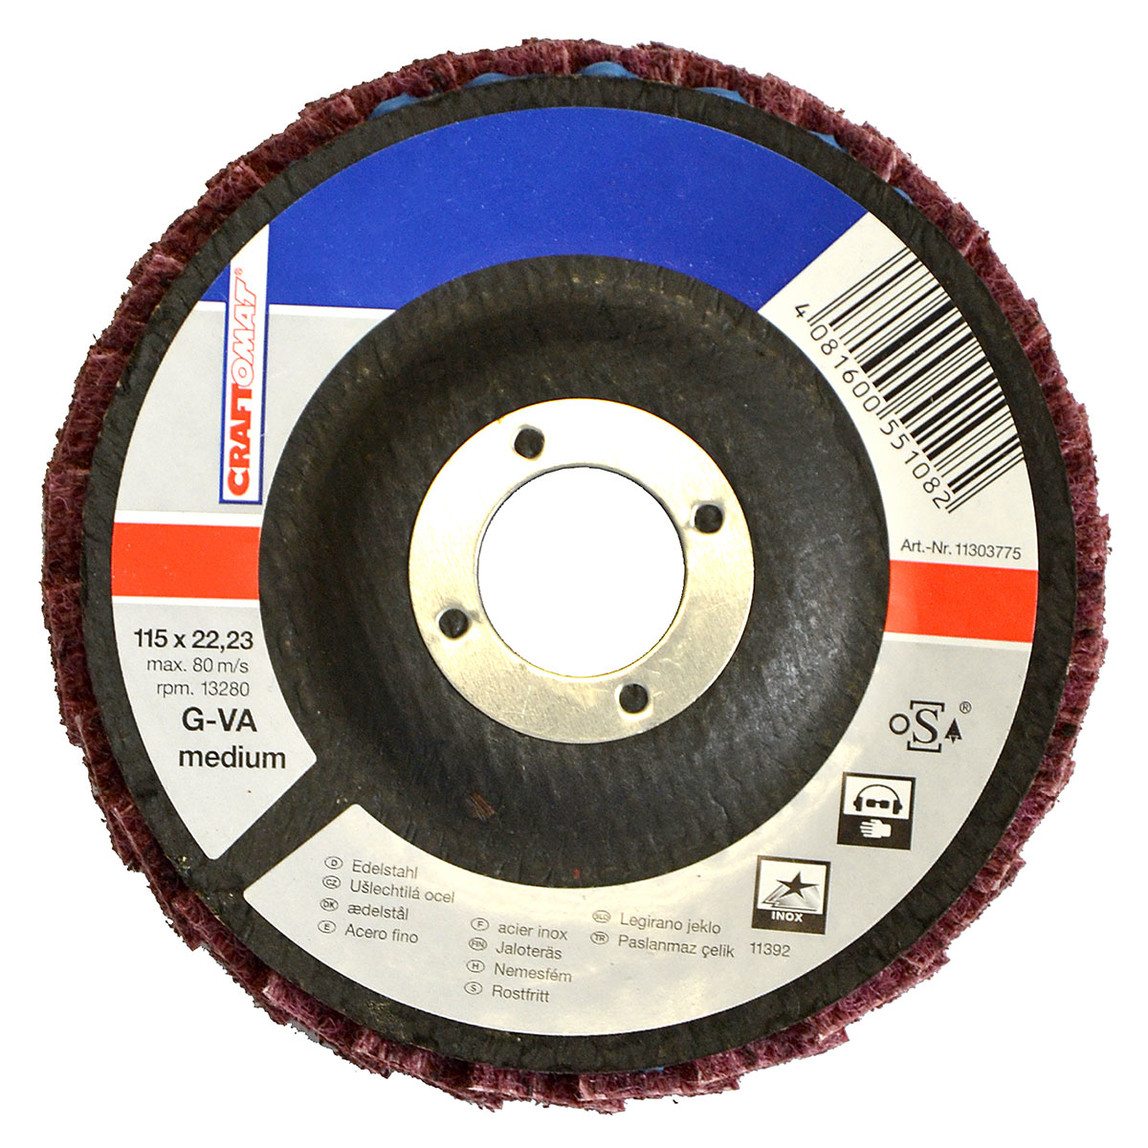 Zımparalama Diski 115 Mm g-Va Medıum